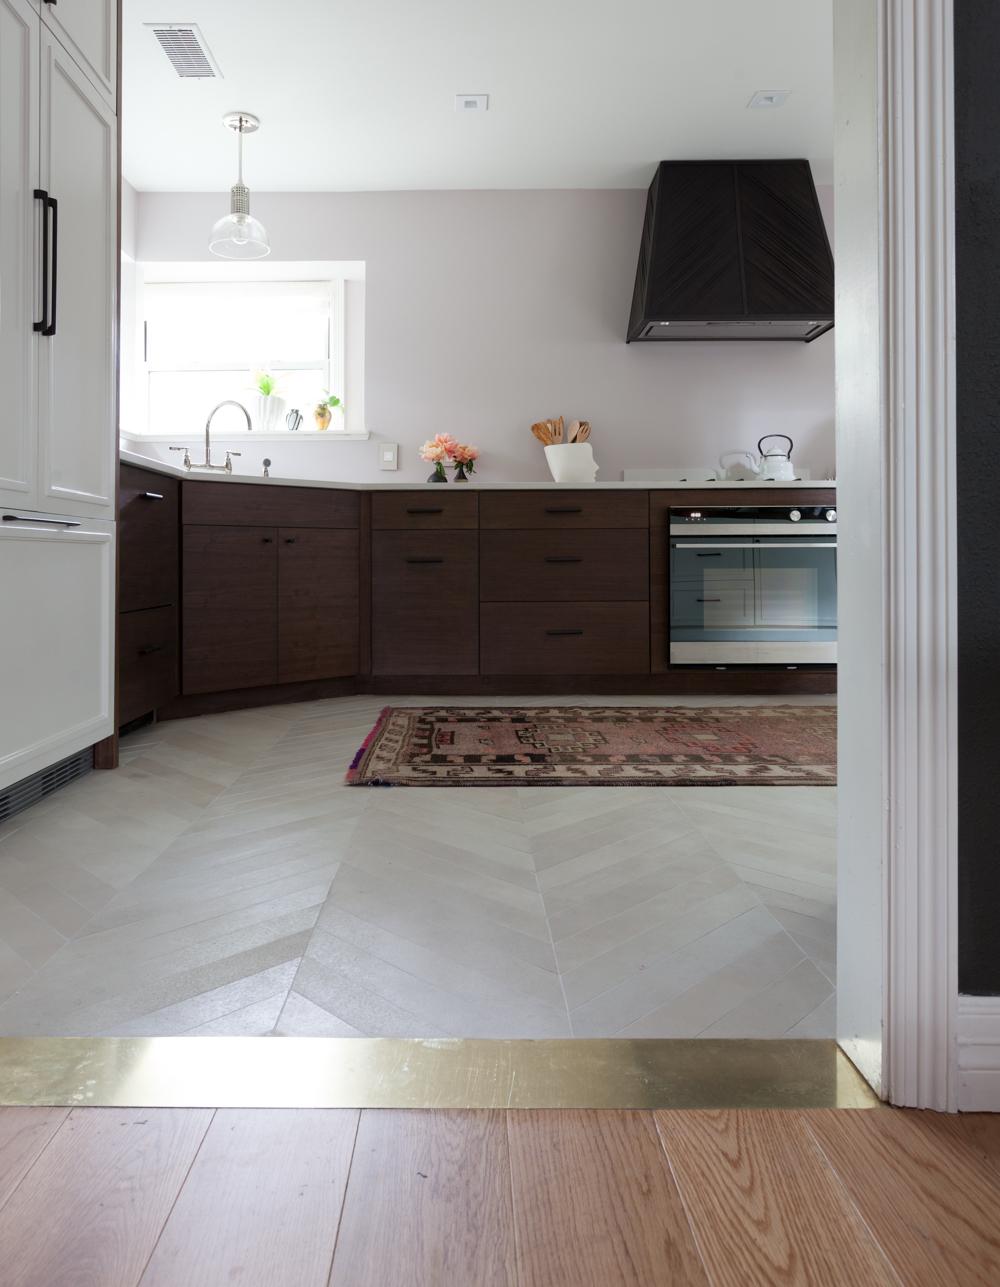 Brass threshold transition strip from white oak wood floors to chevron porcelain floors. Antique vintage Turkish rug.